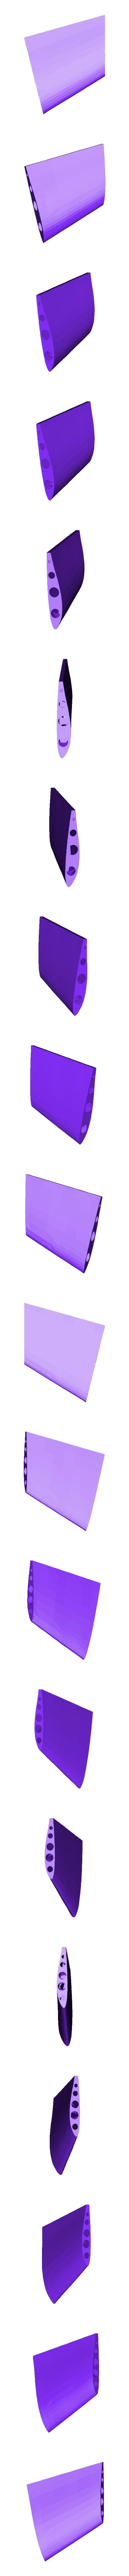 Wing L 3.obj Download free OBJ file Small Static Horten 229 • 3D printable object, francoispeyper